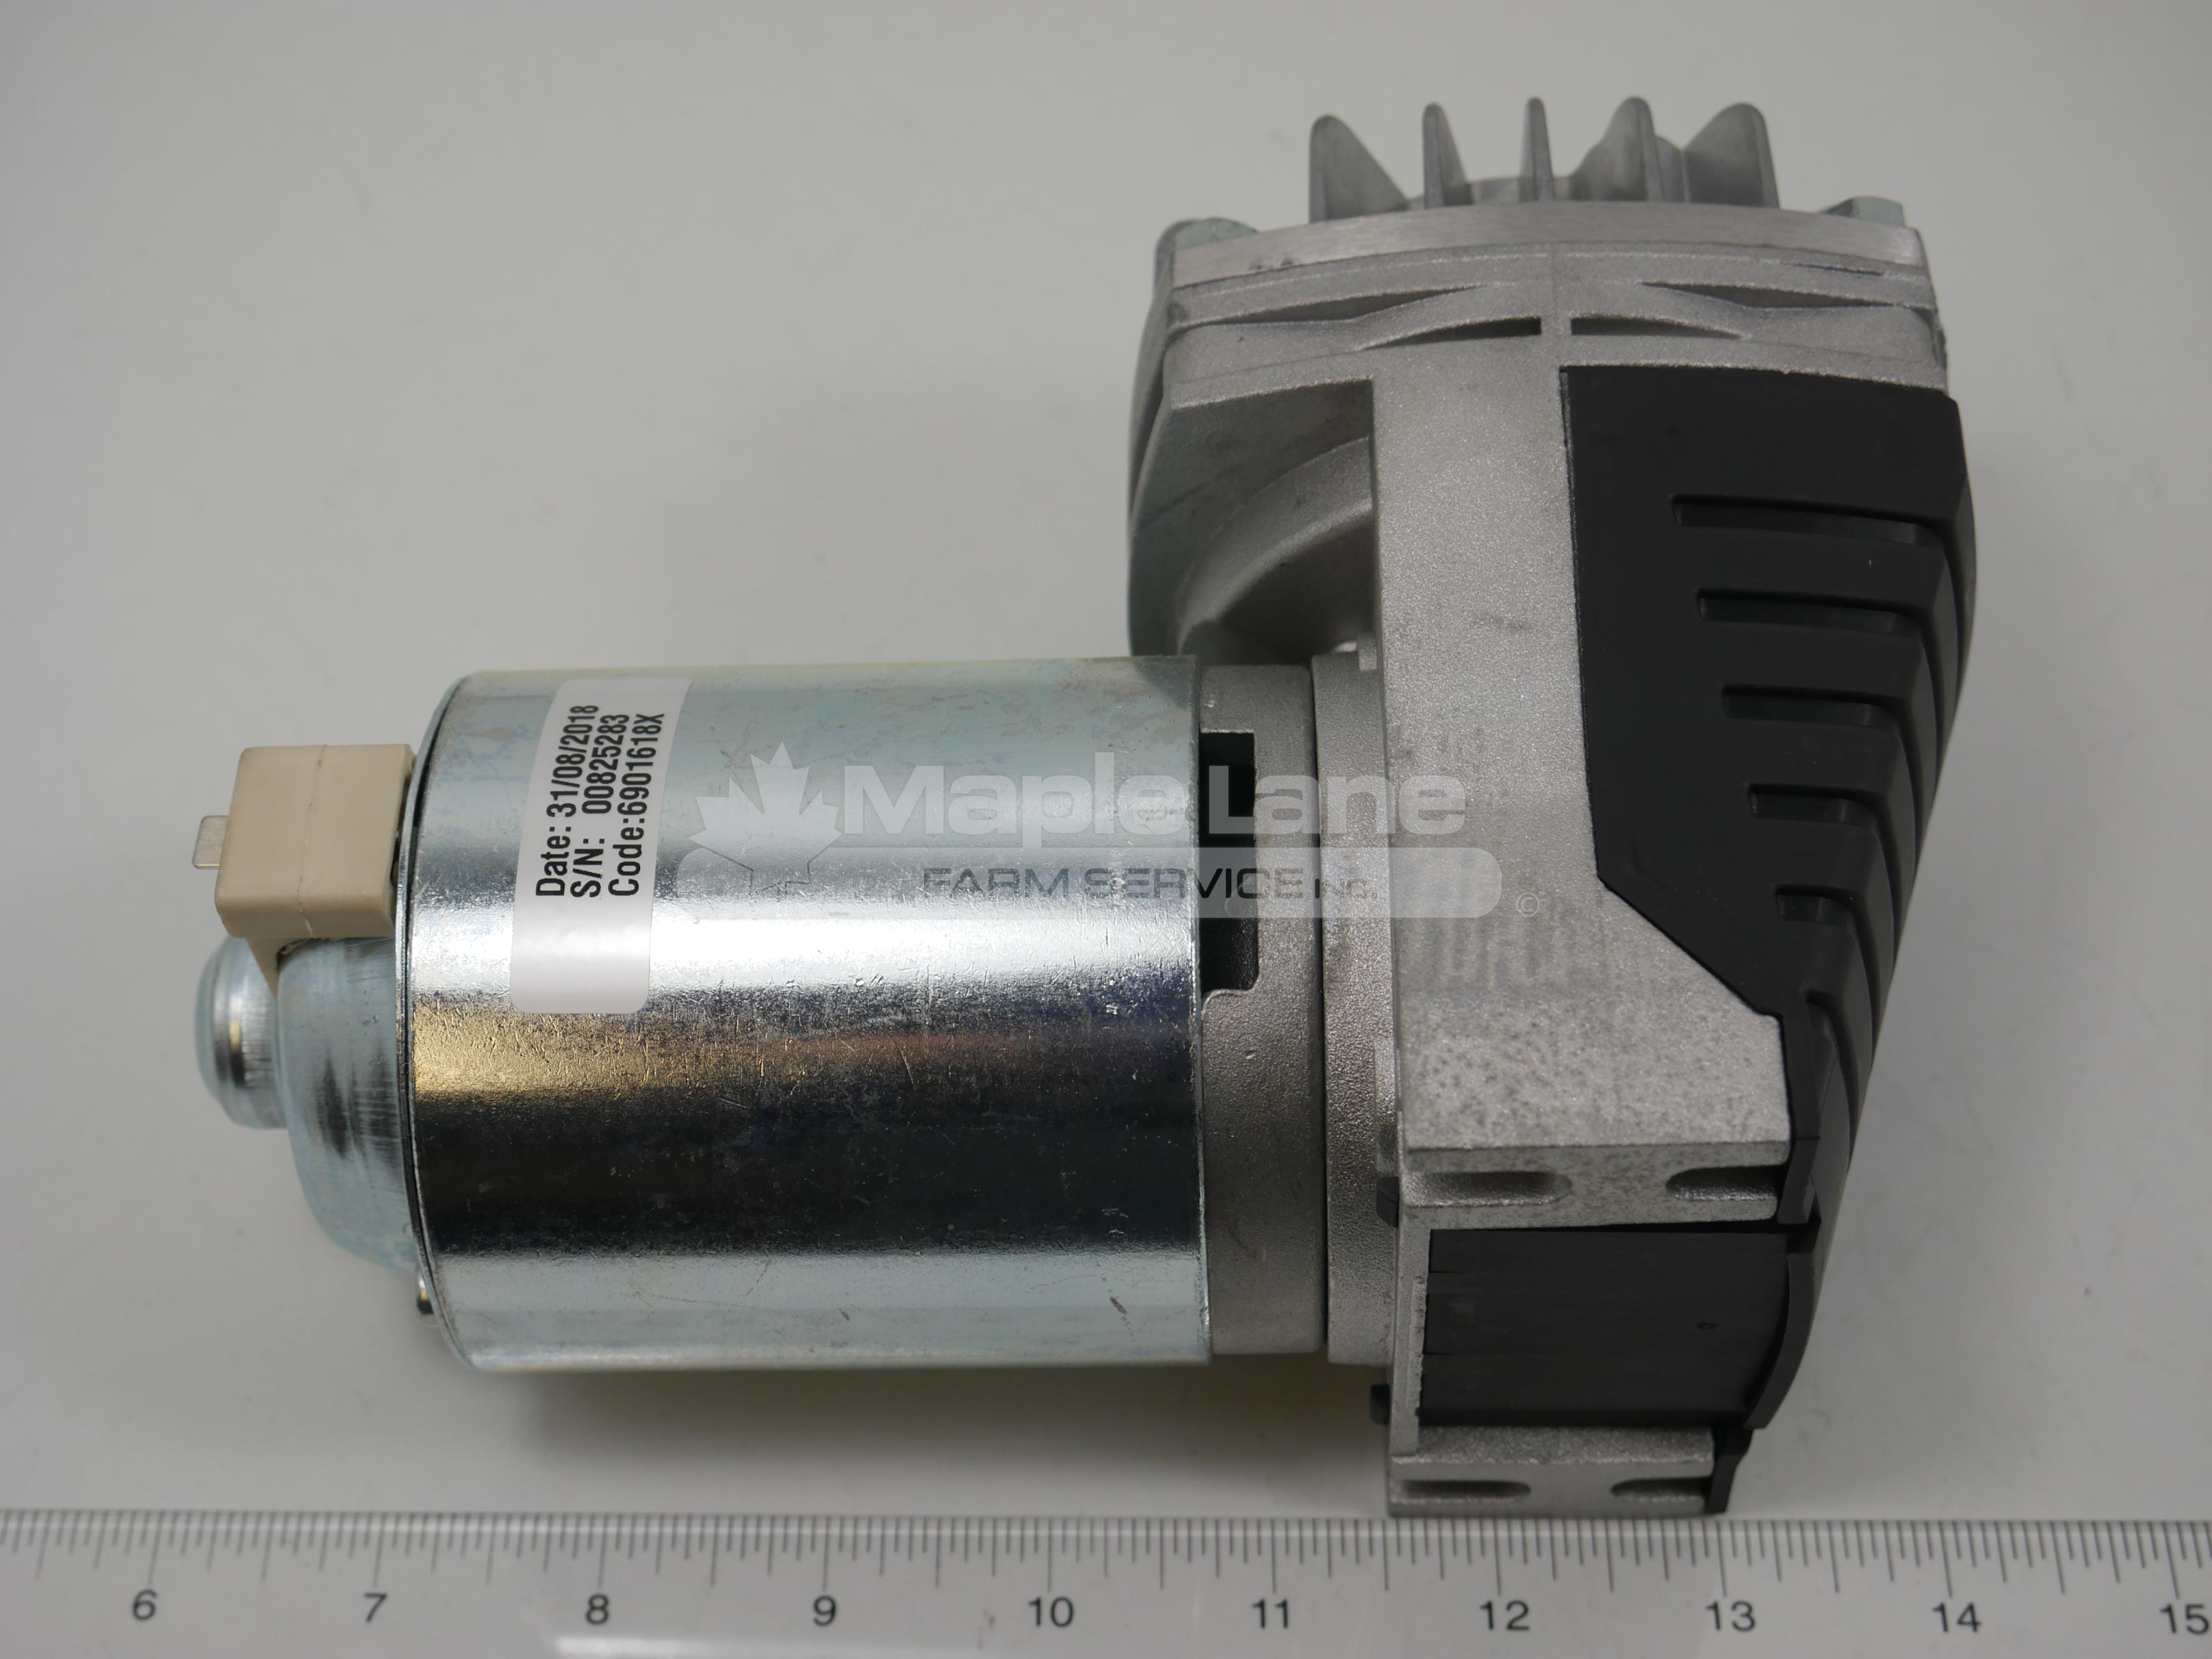 26023400 Foam Marker Compressor